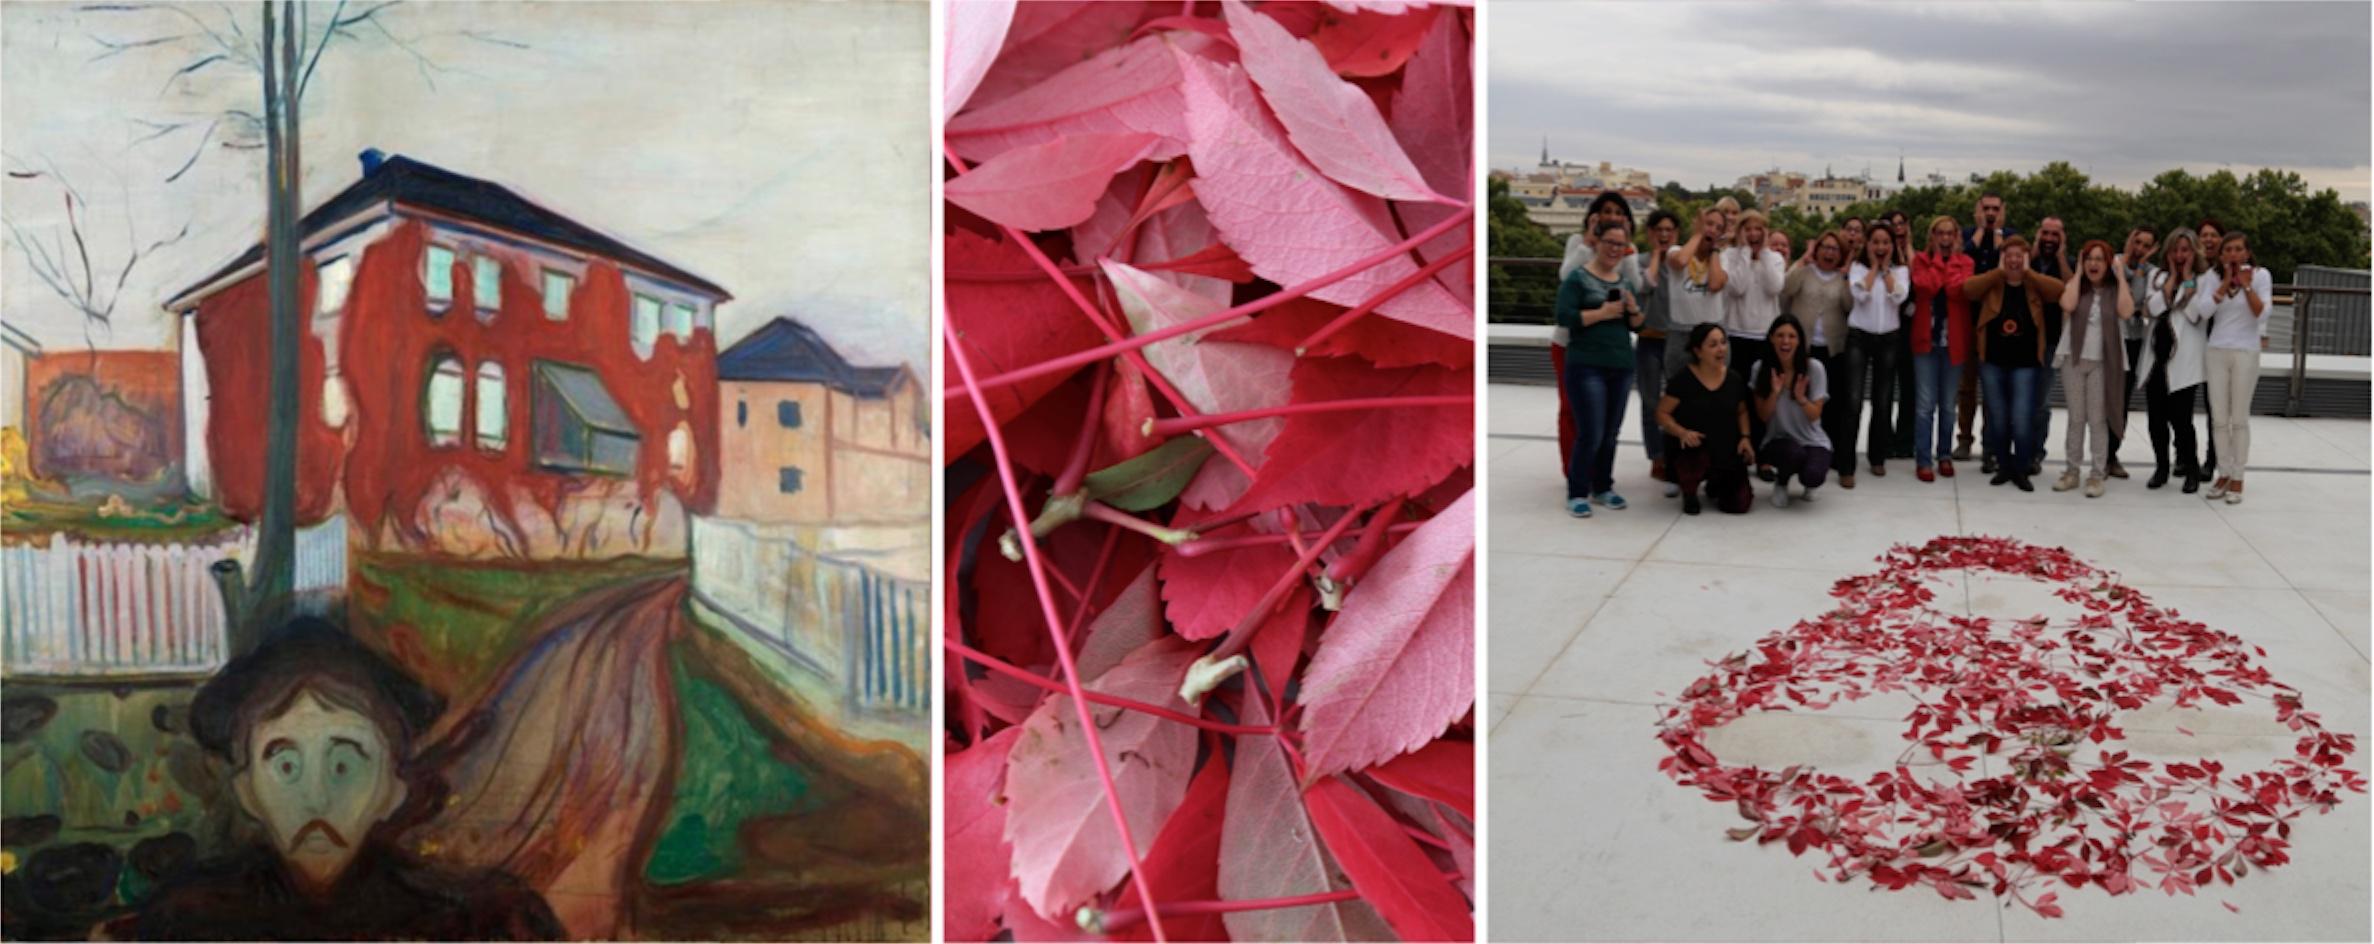 Munch: Enredadera roja 1898 © Munch-Ellingsen Group. Un Grito de la Naturaleza con enredaderas rojas at EducaThyssen